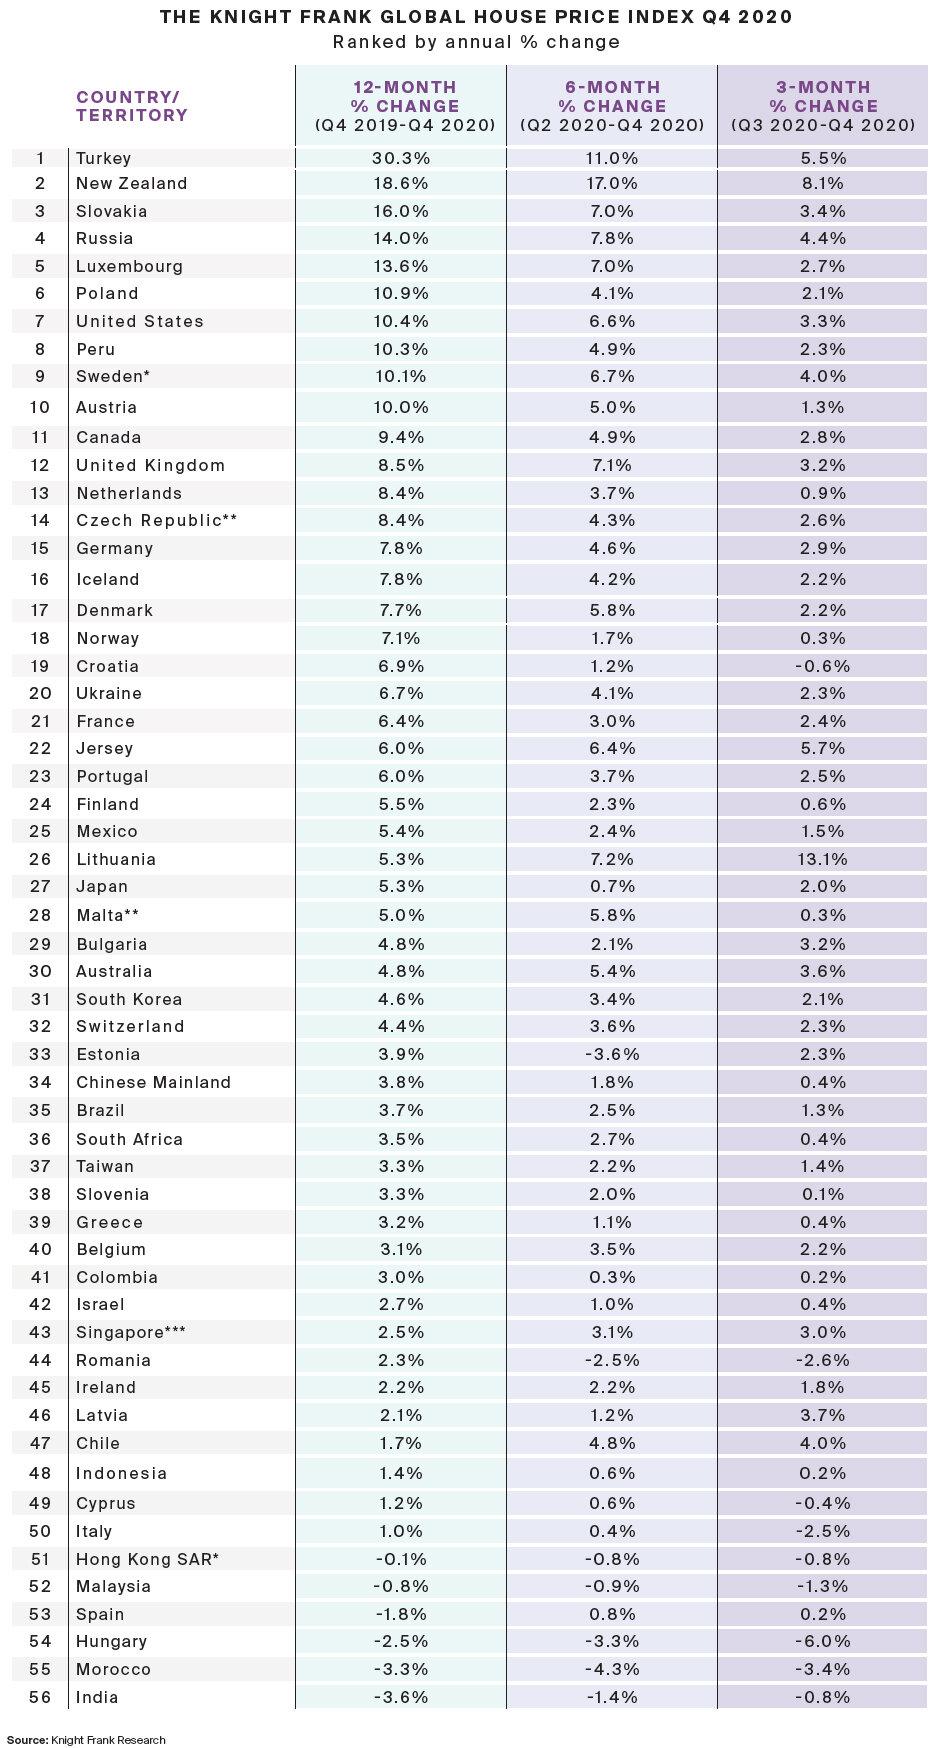 International-property-sales-data-for-2020.jpg